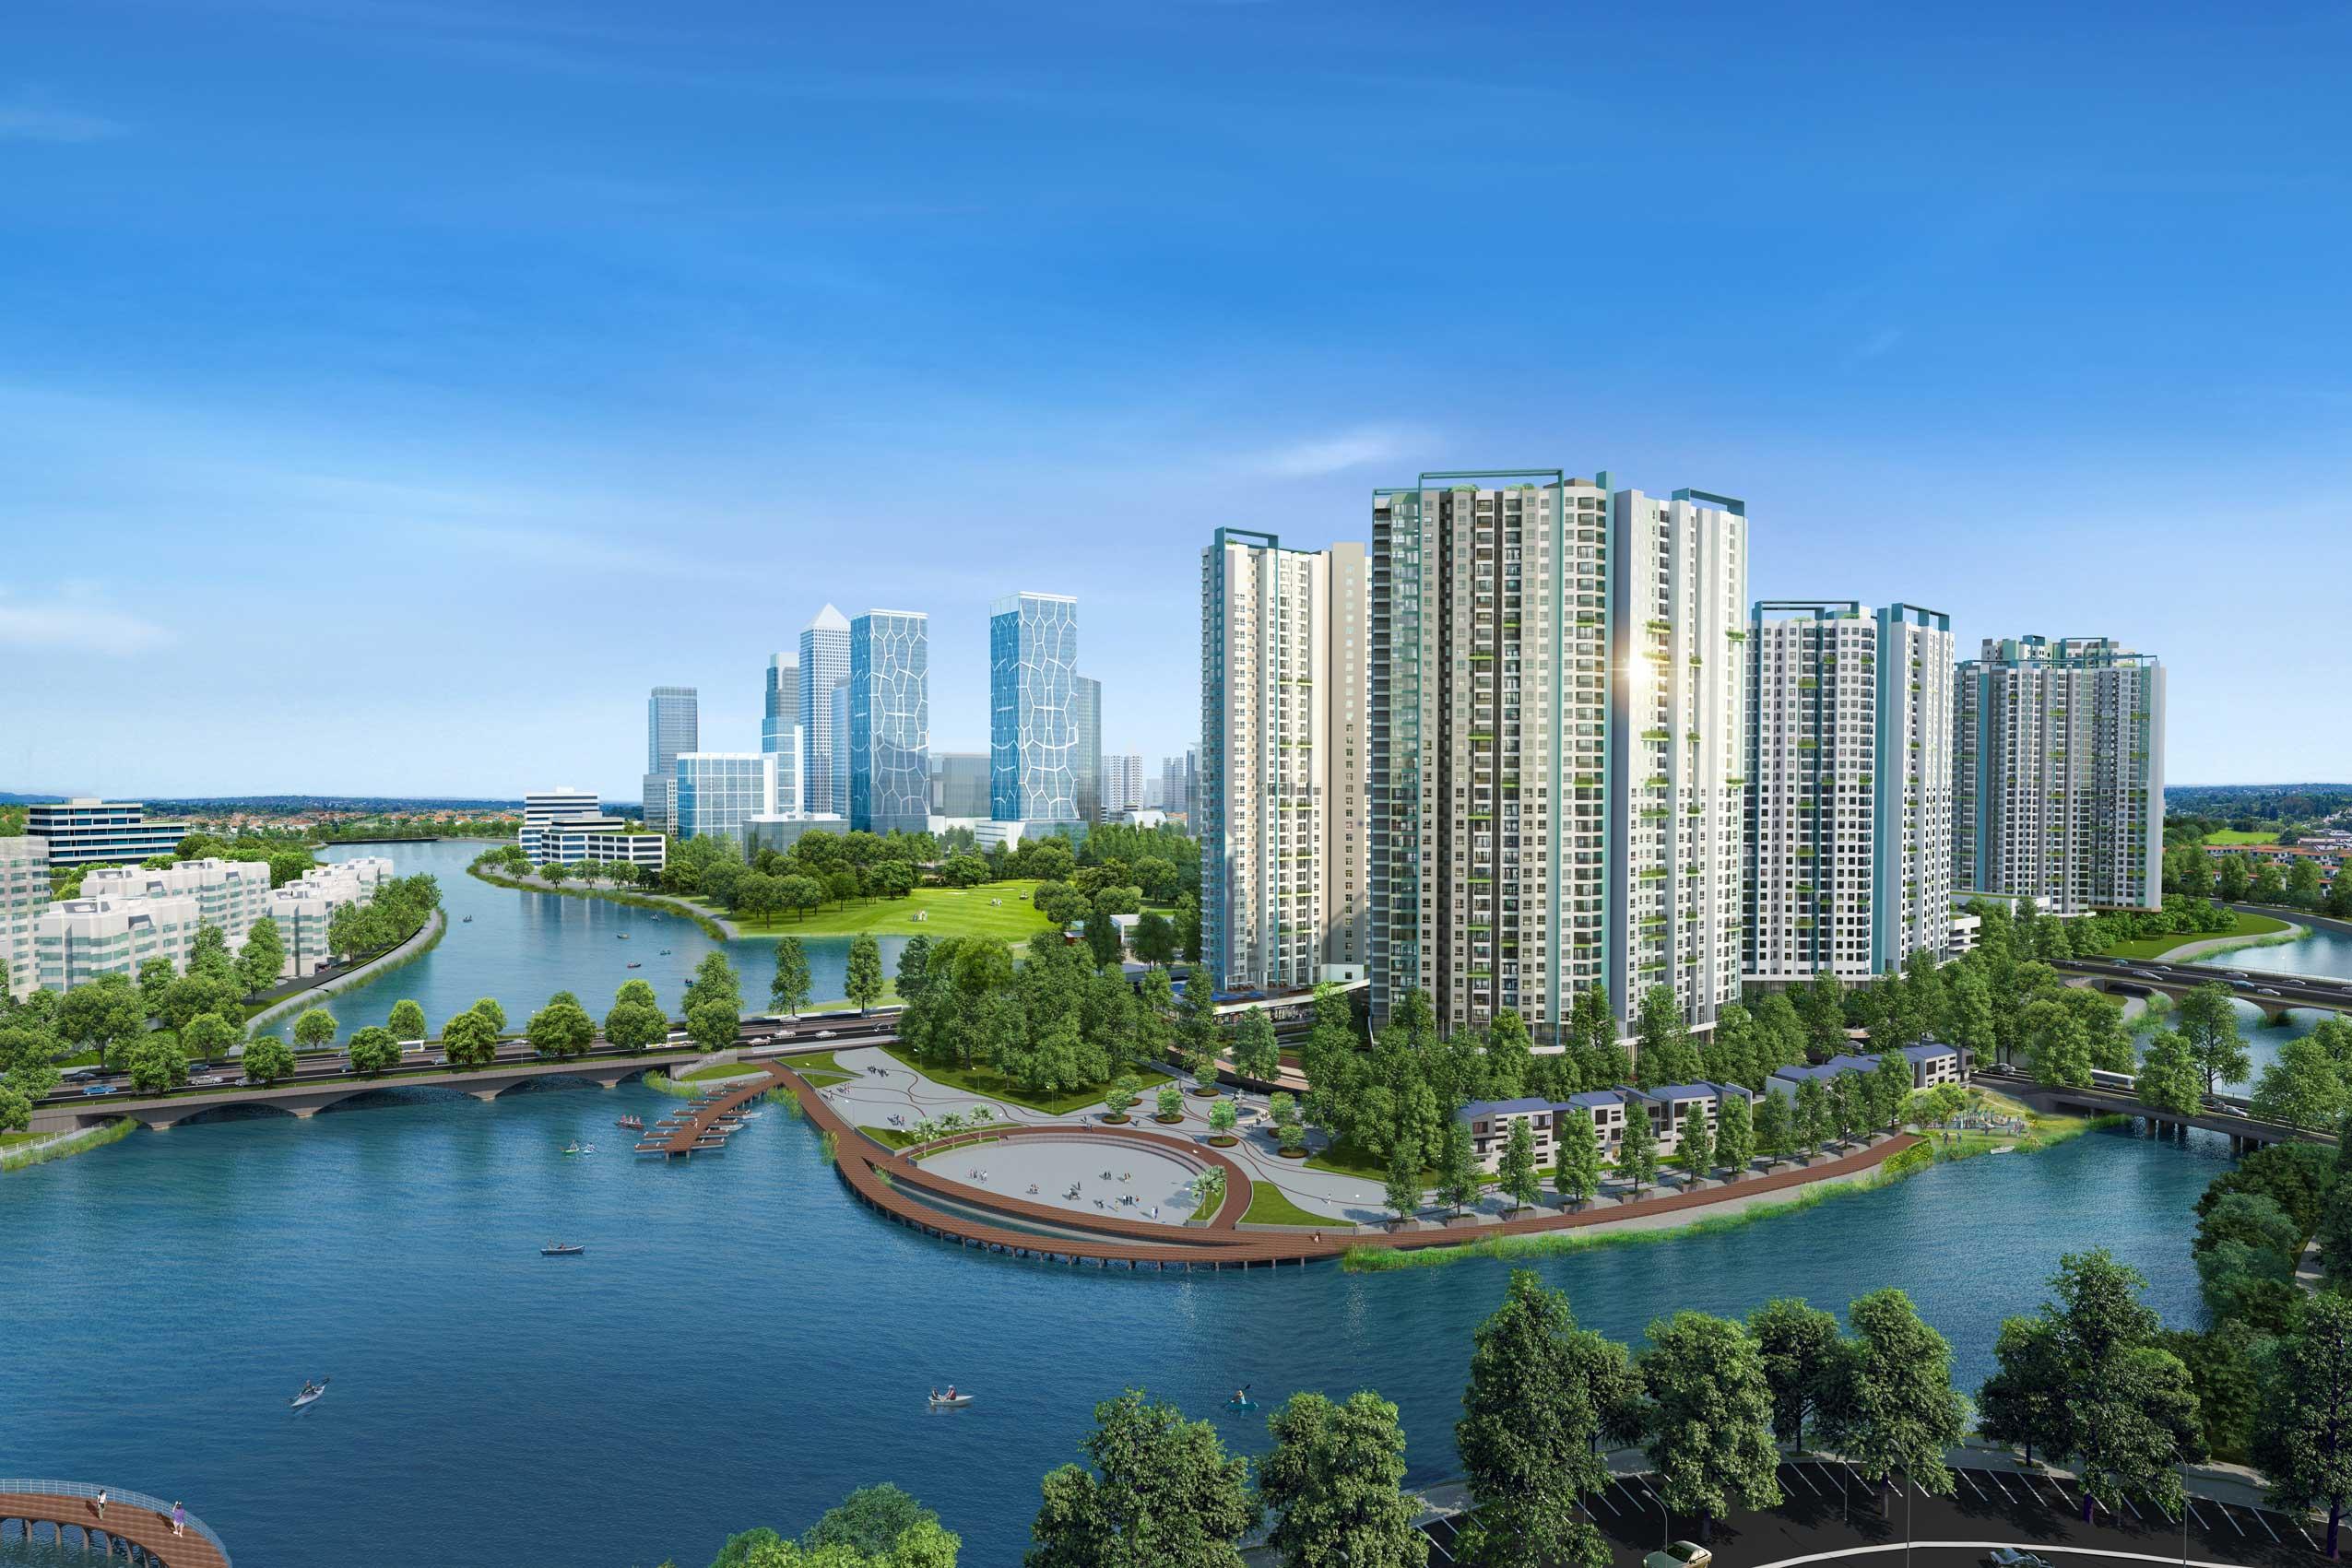 Chung cư aqua bay sky residences